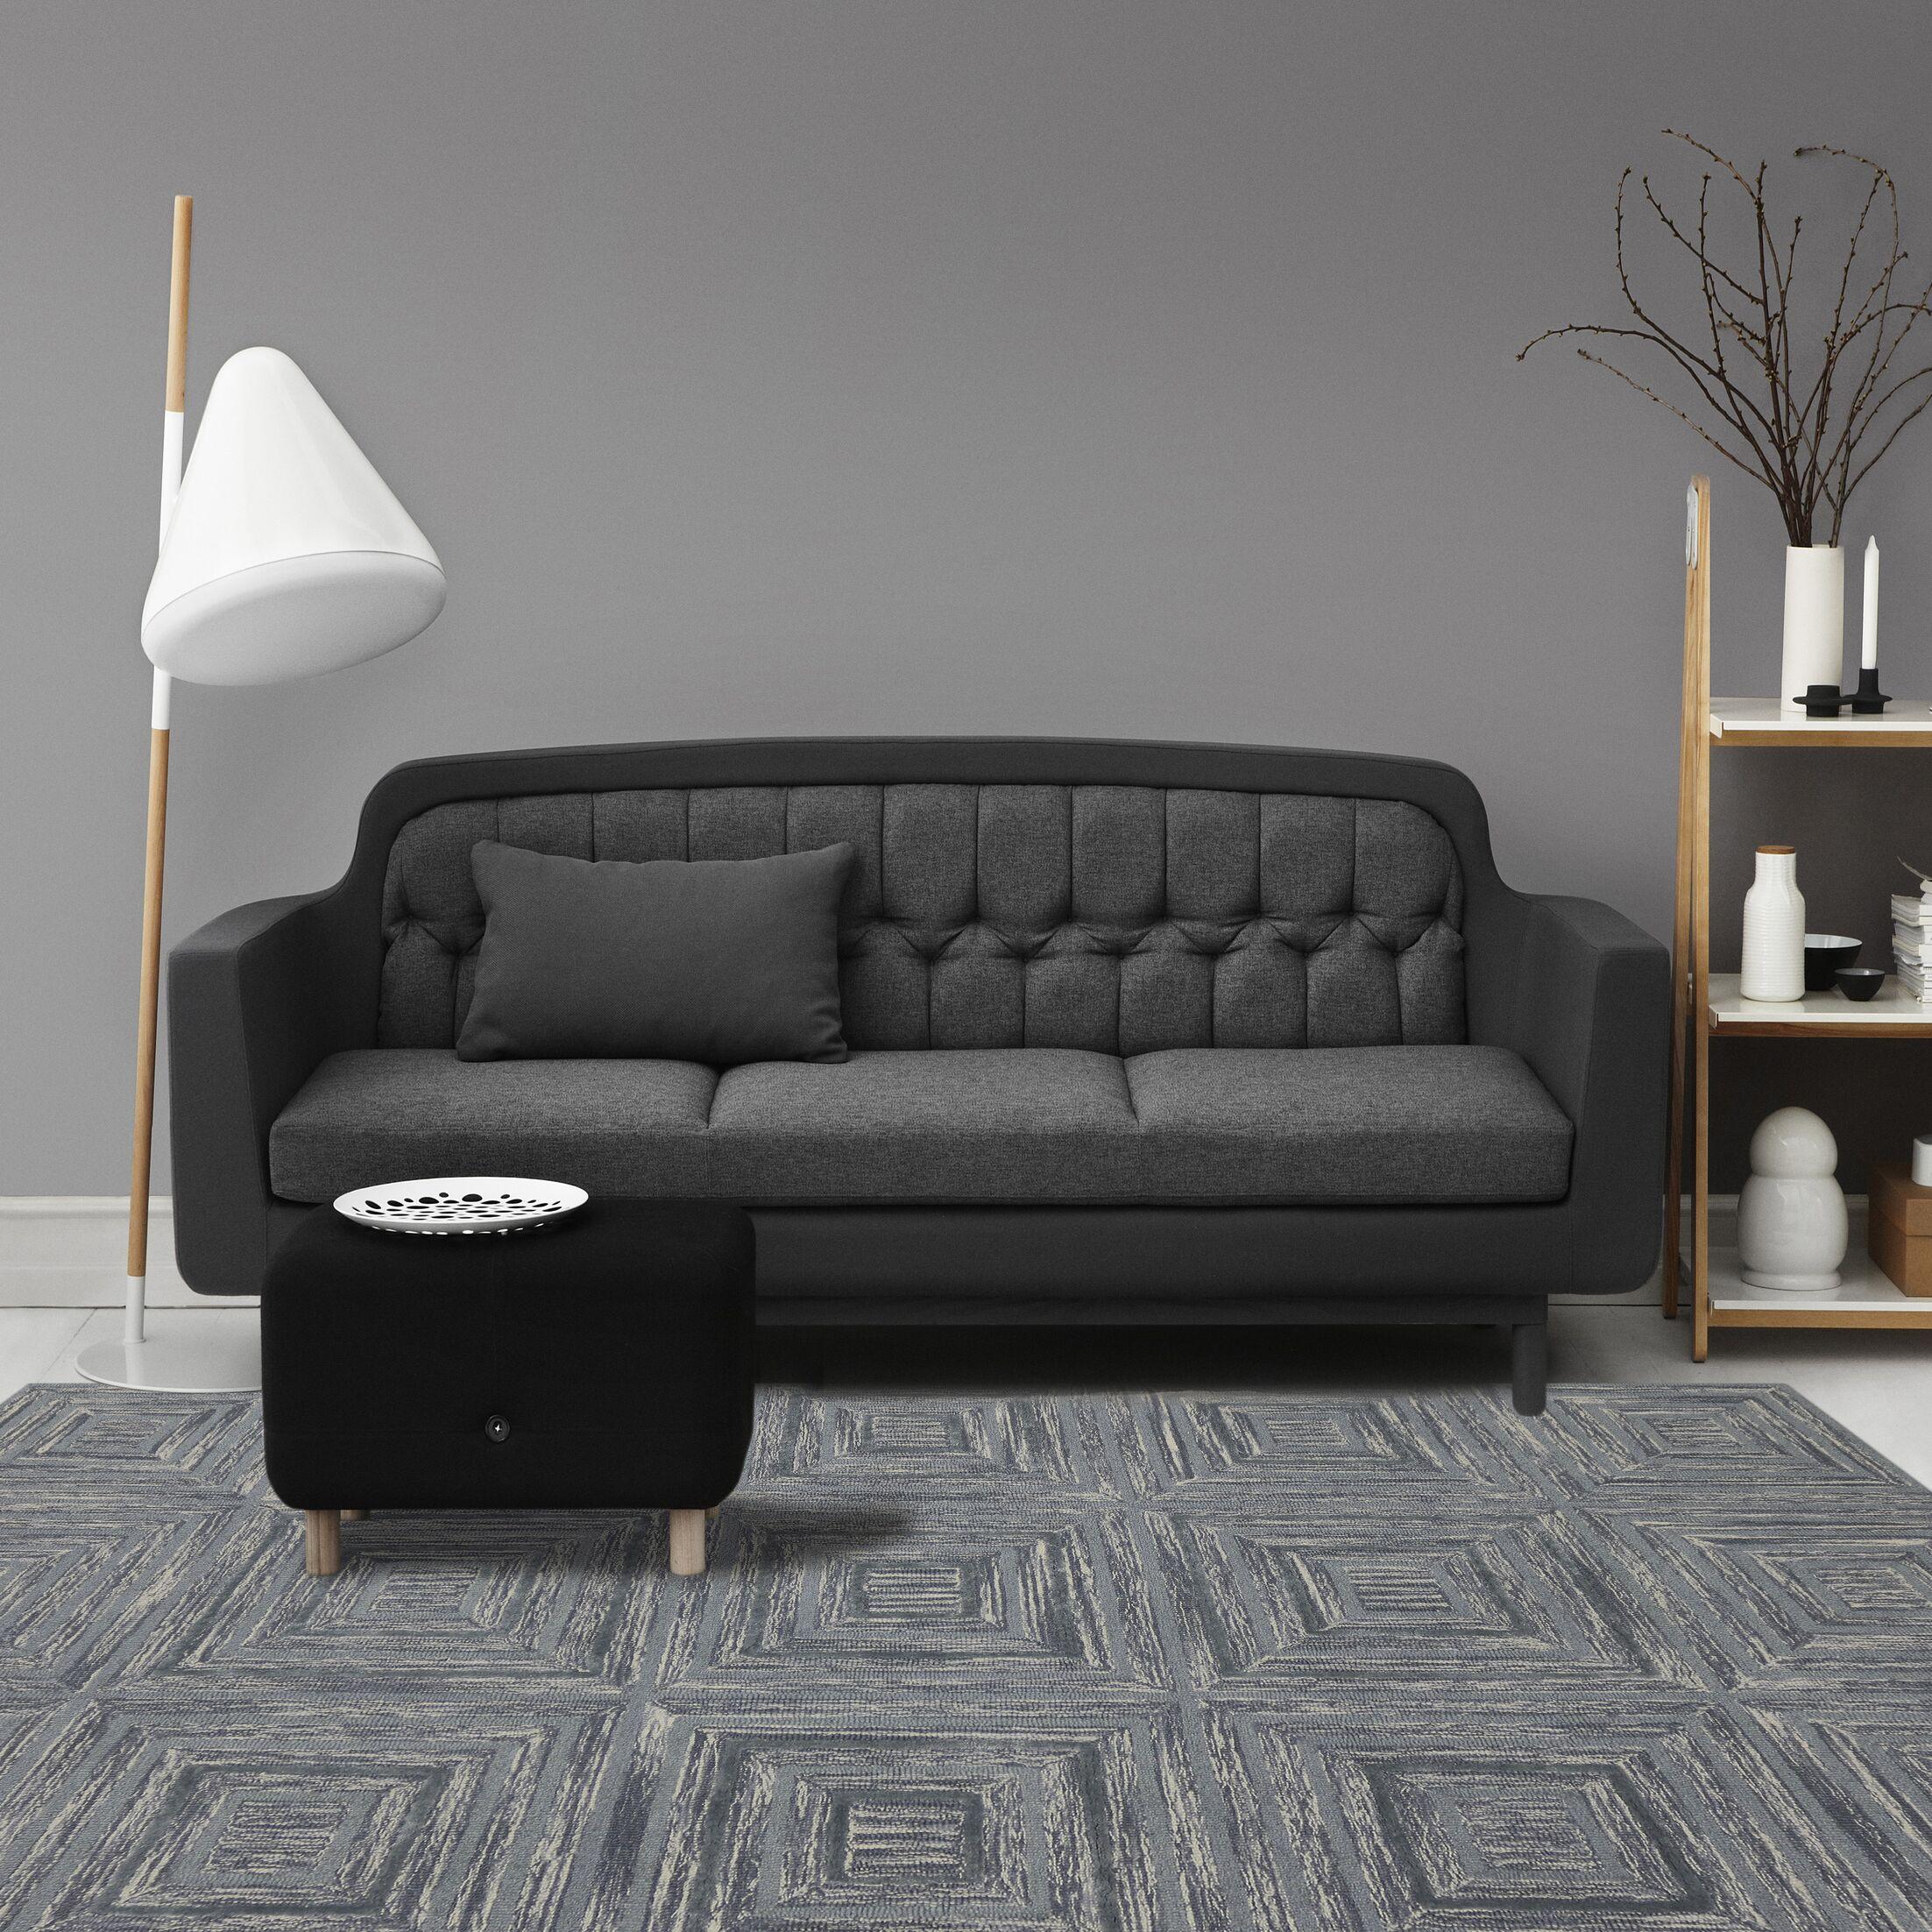 Weesner Hand-Tufted Handmade Blue Area Rug Rug Size: 5' x 8'